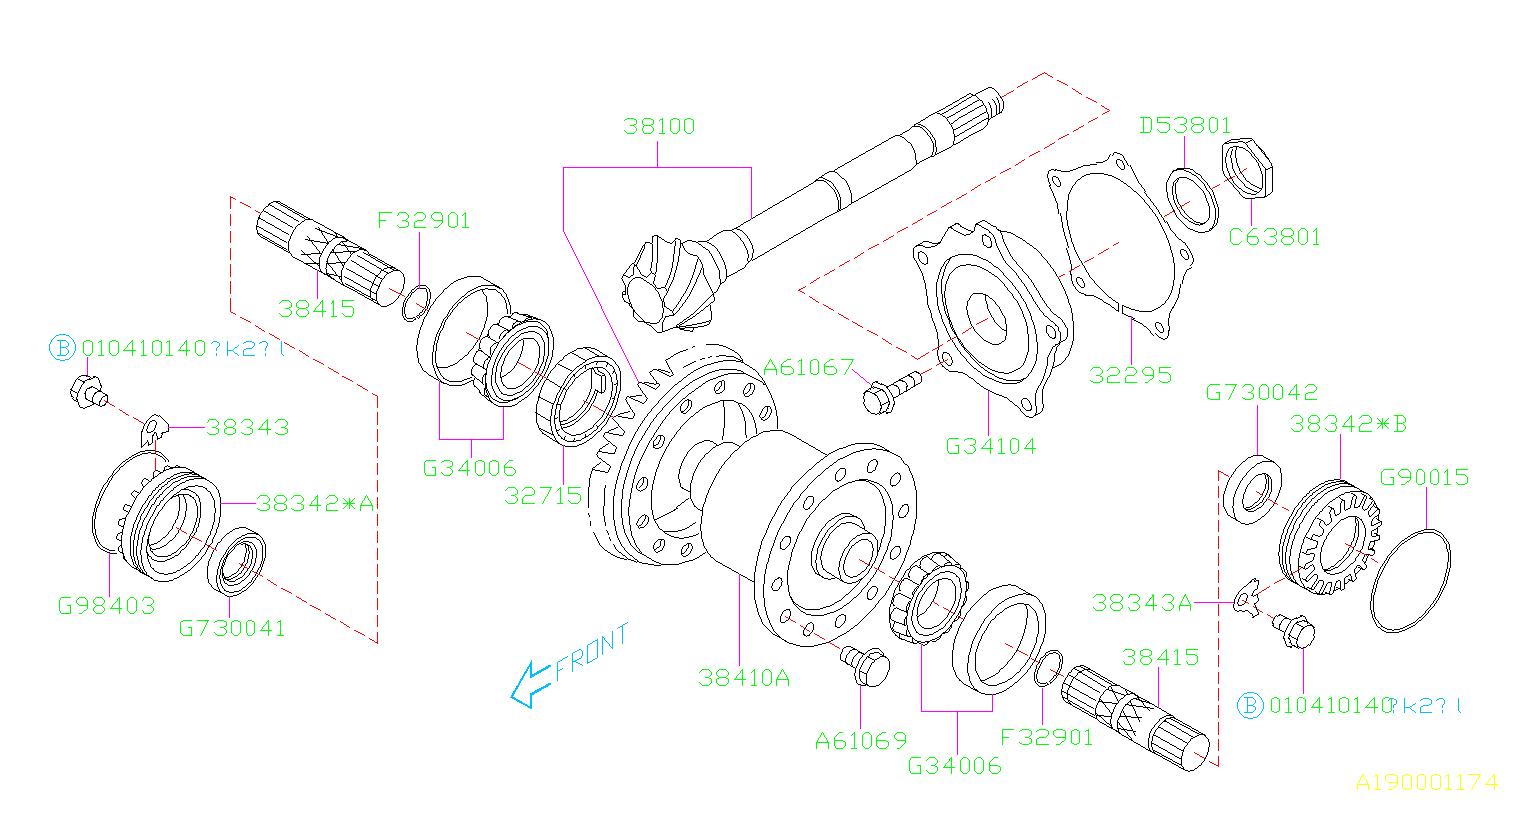 Subaru Impreza Shaft Axle Drive  2wd-turbo  U0026 4wd Exc  Differential  Transmission